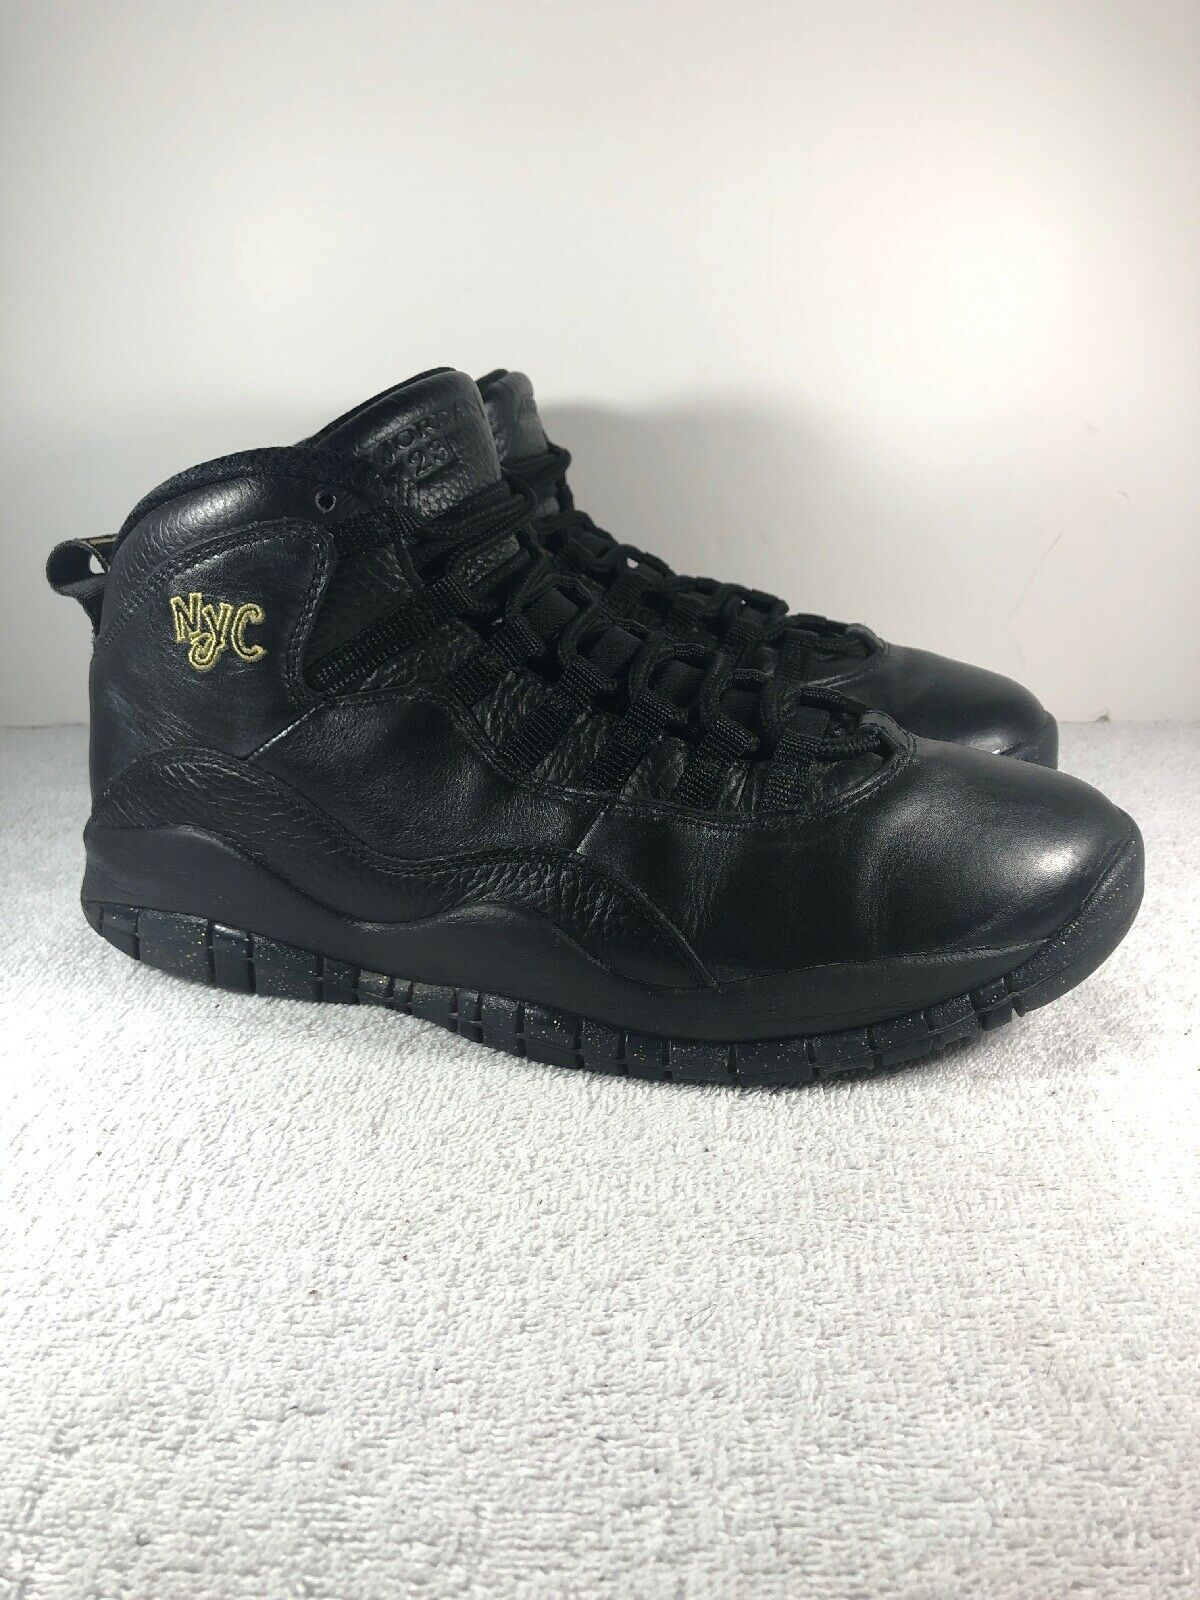 Nike Air Jordan 10 X NYC New York 310805 012 Black gold Size 9  Mens